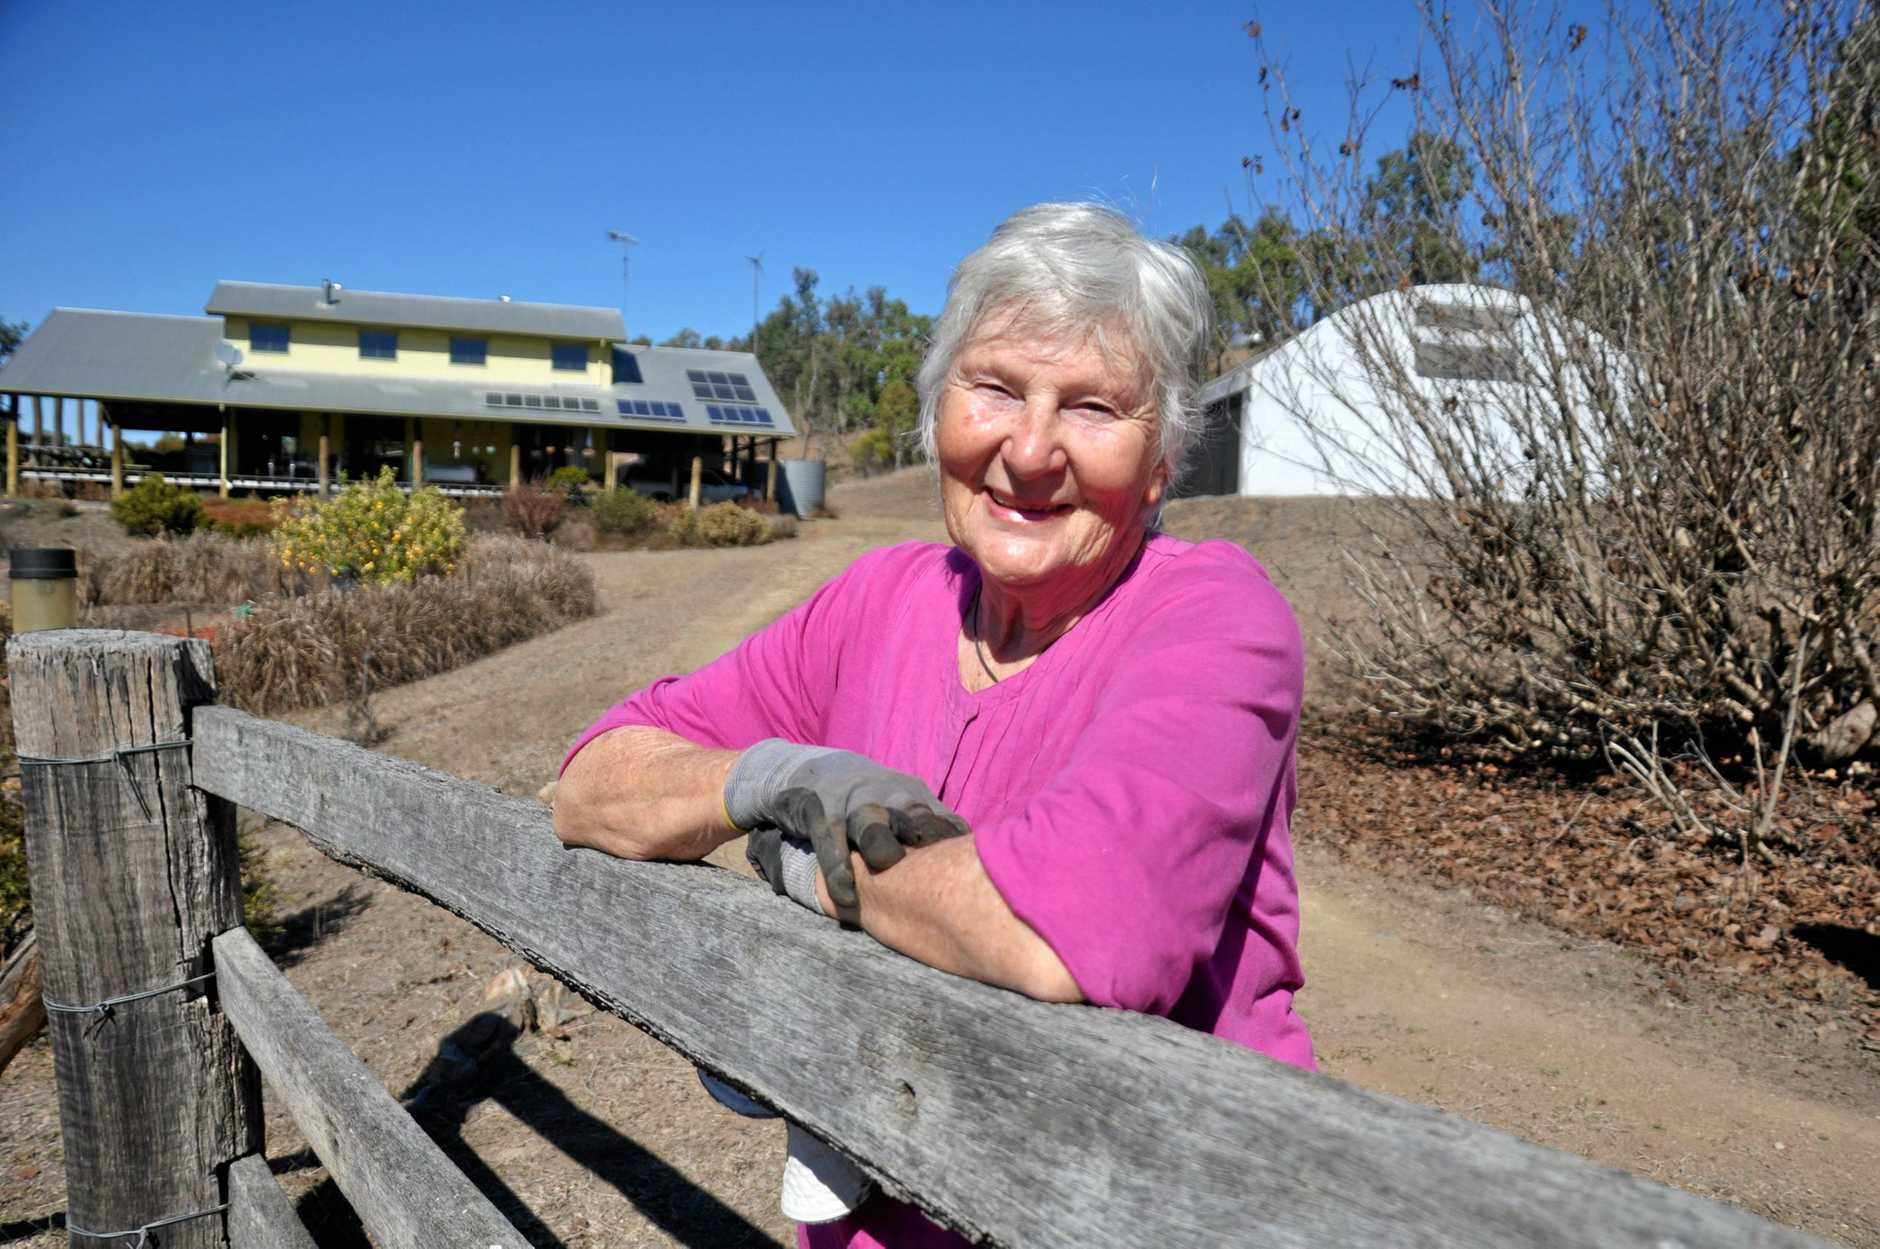 ECO-FRIENDLY: Joan Derrick's 30-acre Bancroft property